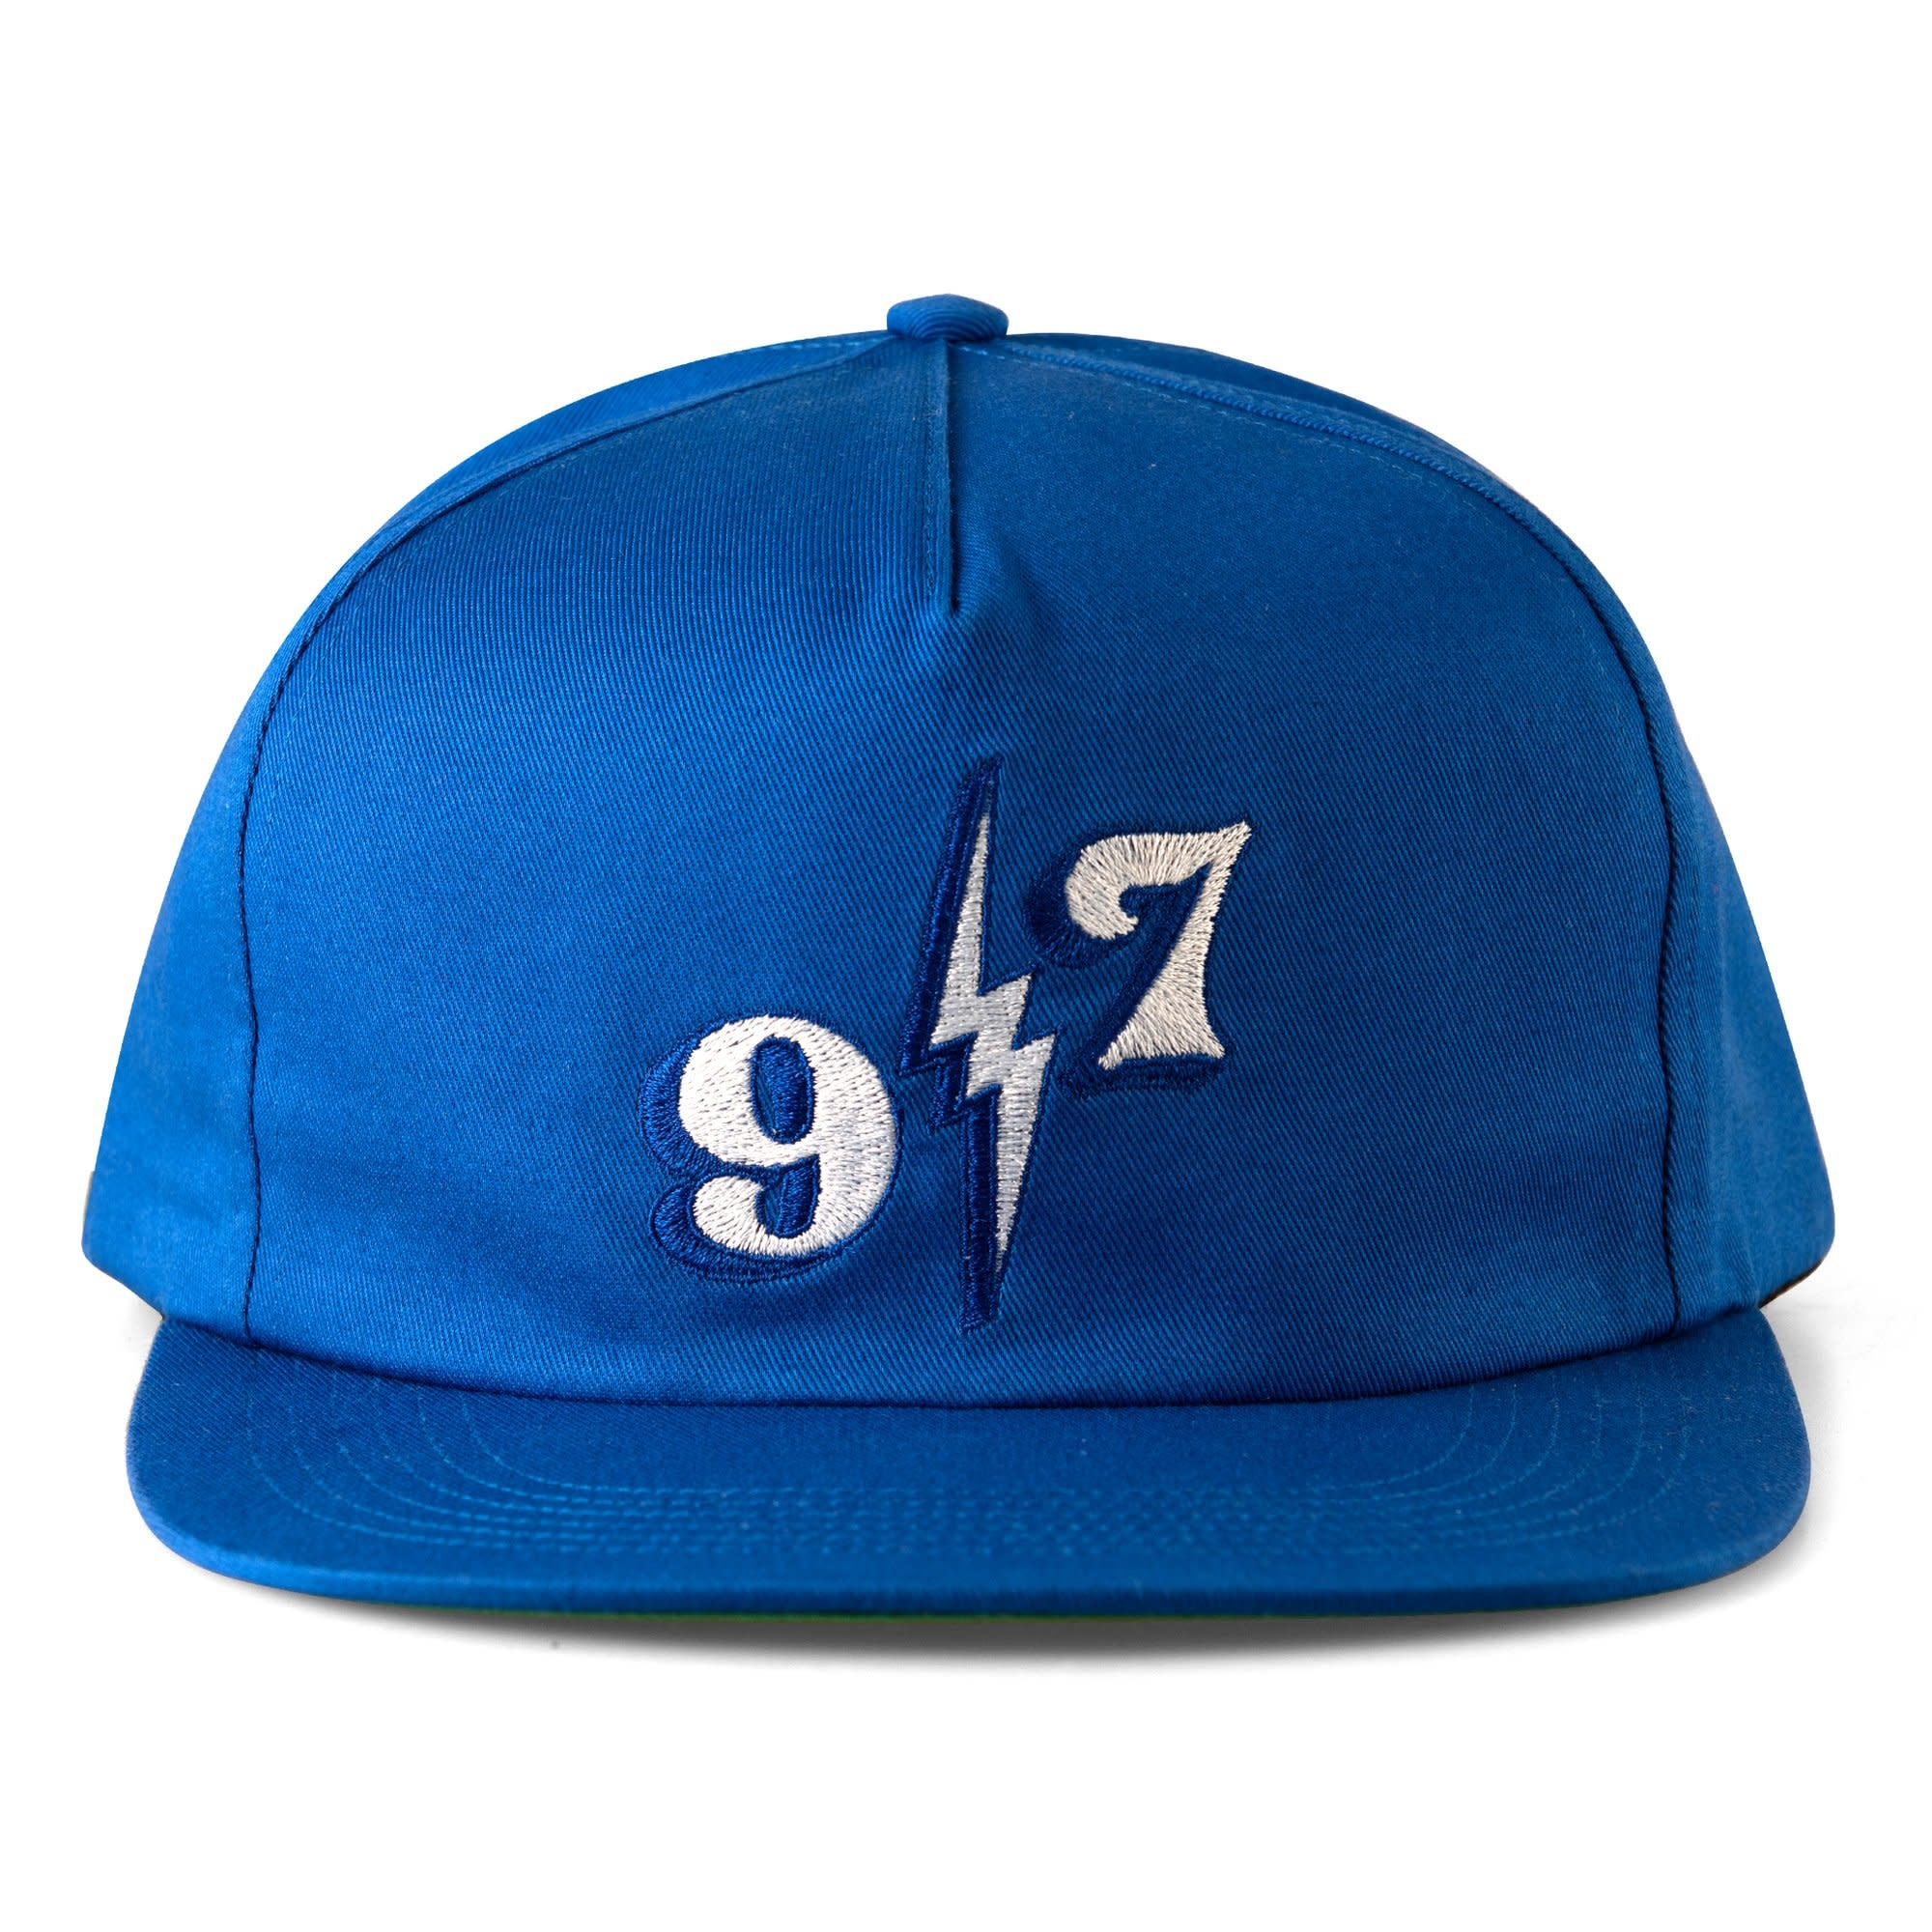 Call Me 917 Bolt Royal Snapback